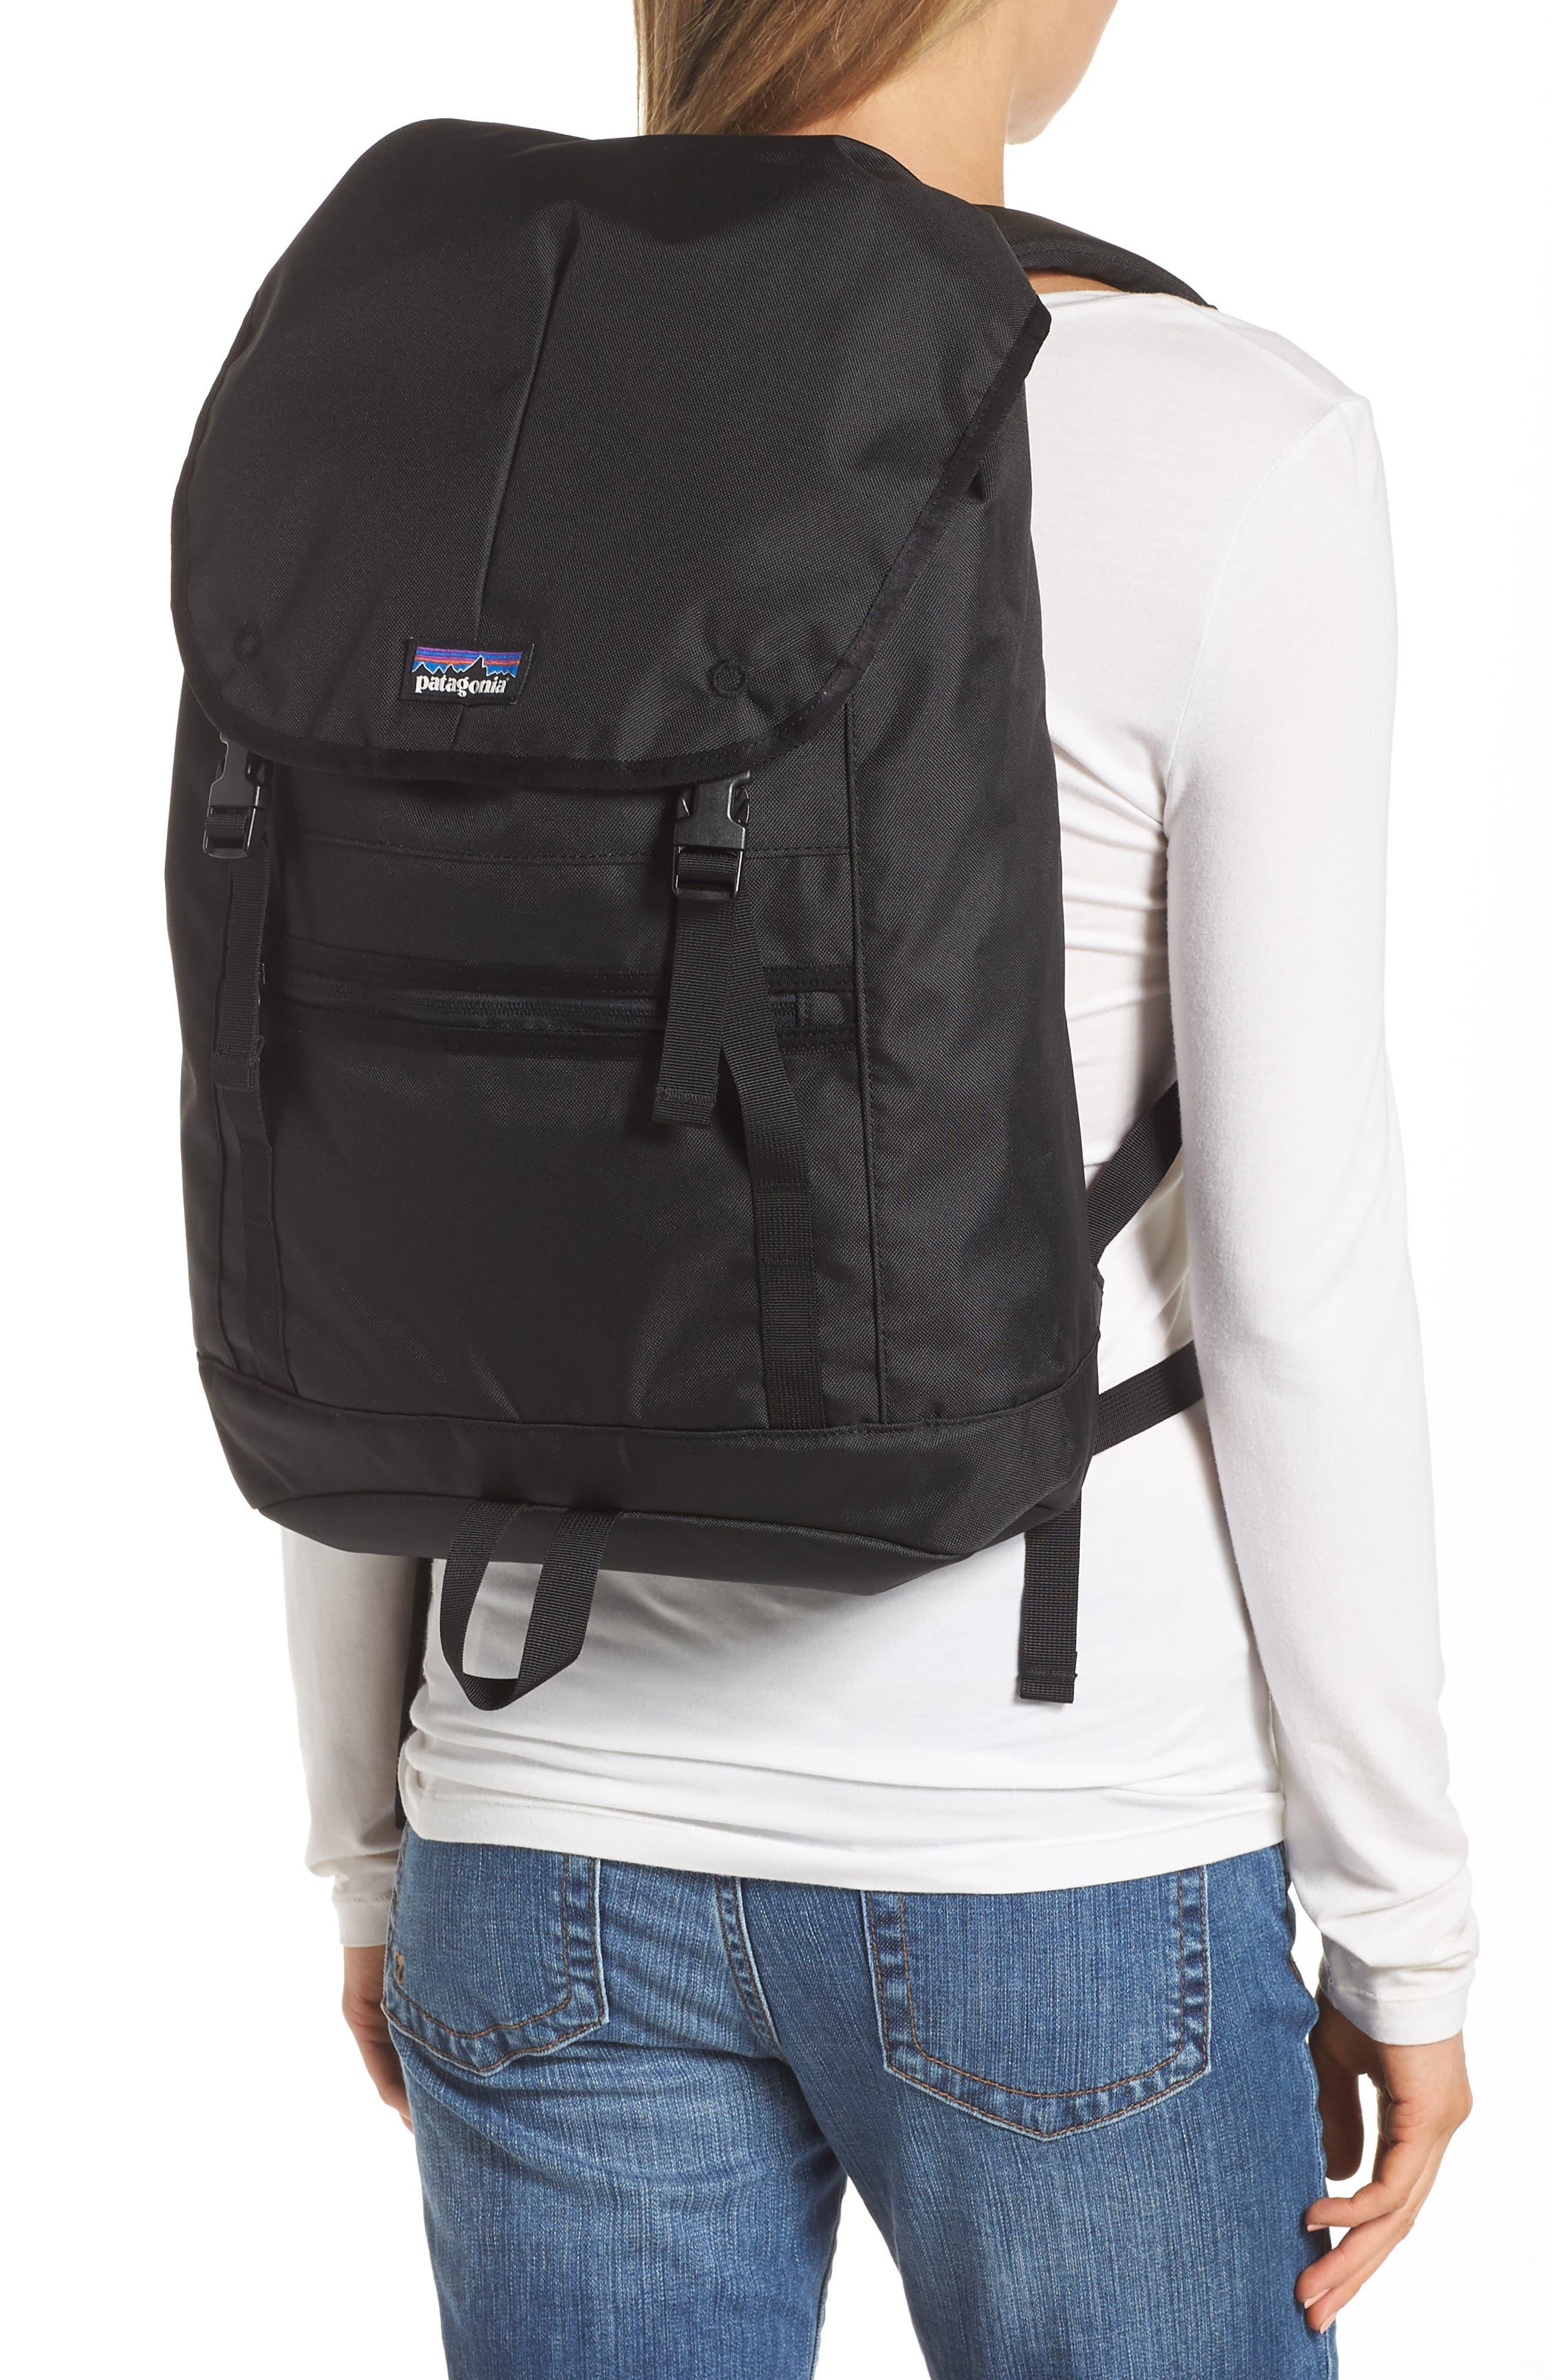 PATAGONIA,                             Arbor 25-Liter Backpack,                             Alternate thumbnail 2, color,                             001